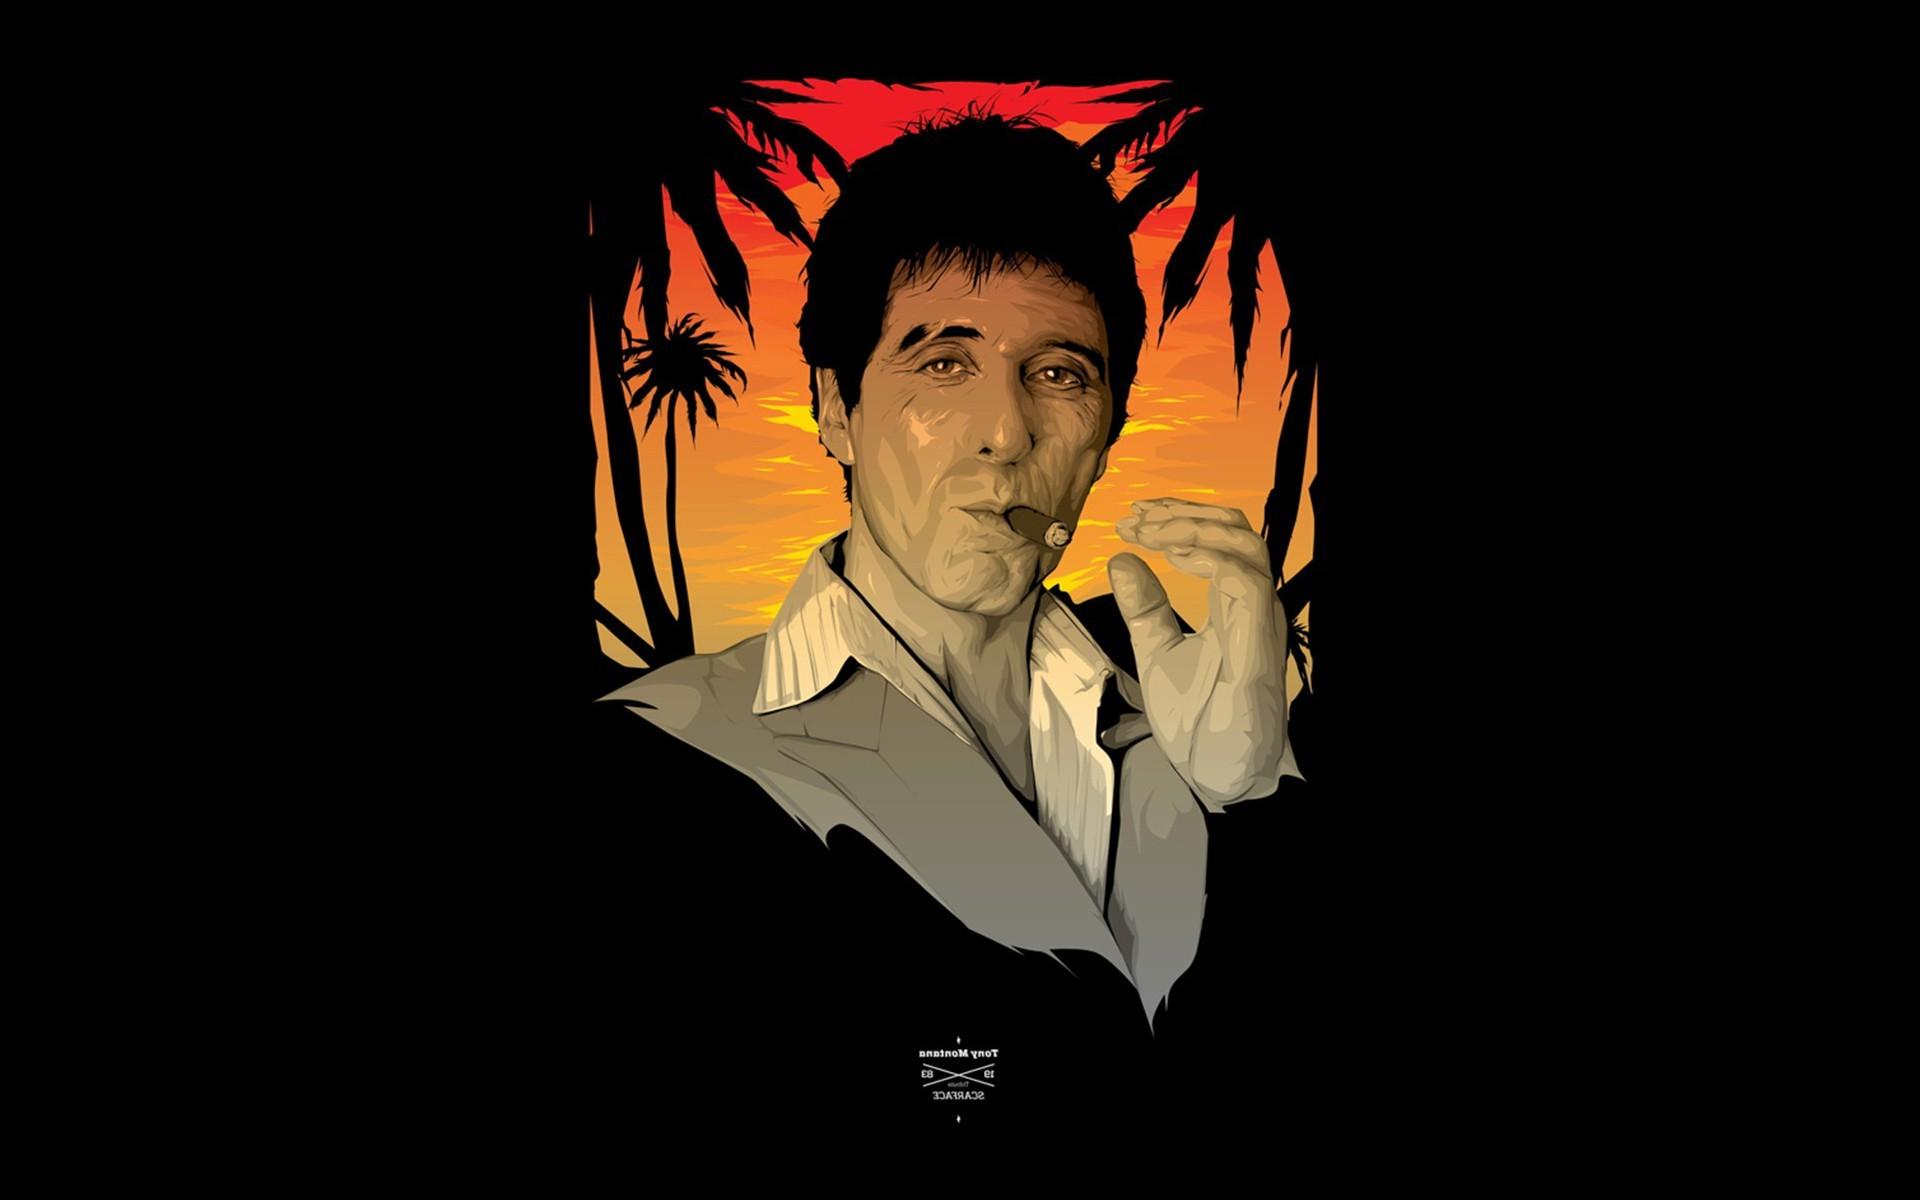 Wallpaper Illustration Anime Movies Fan Art Al Pacino